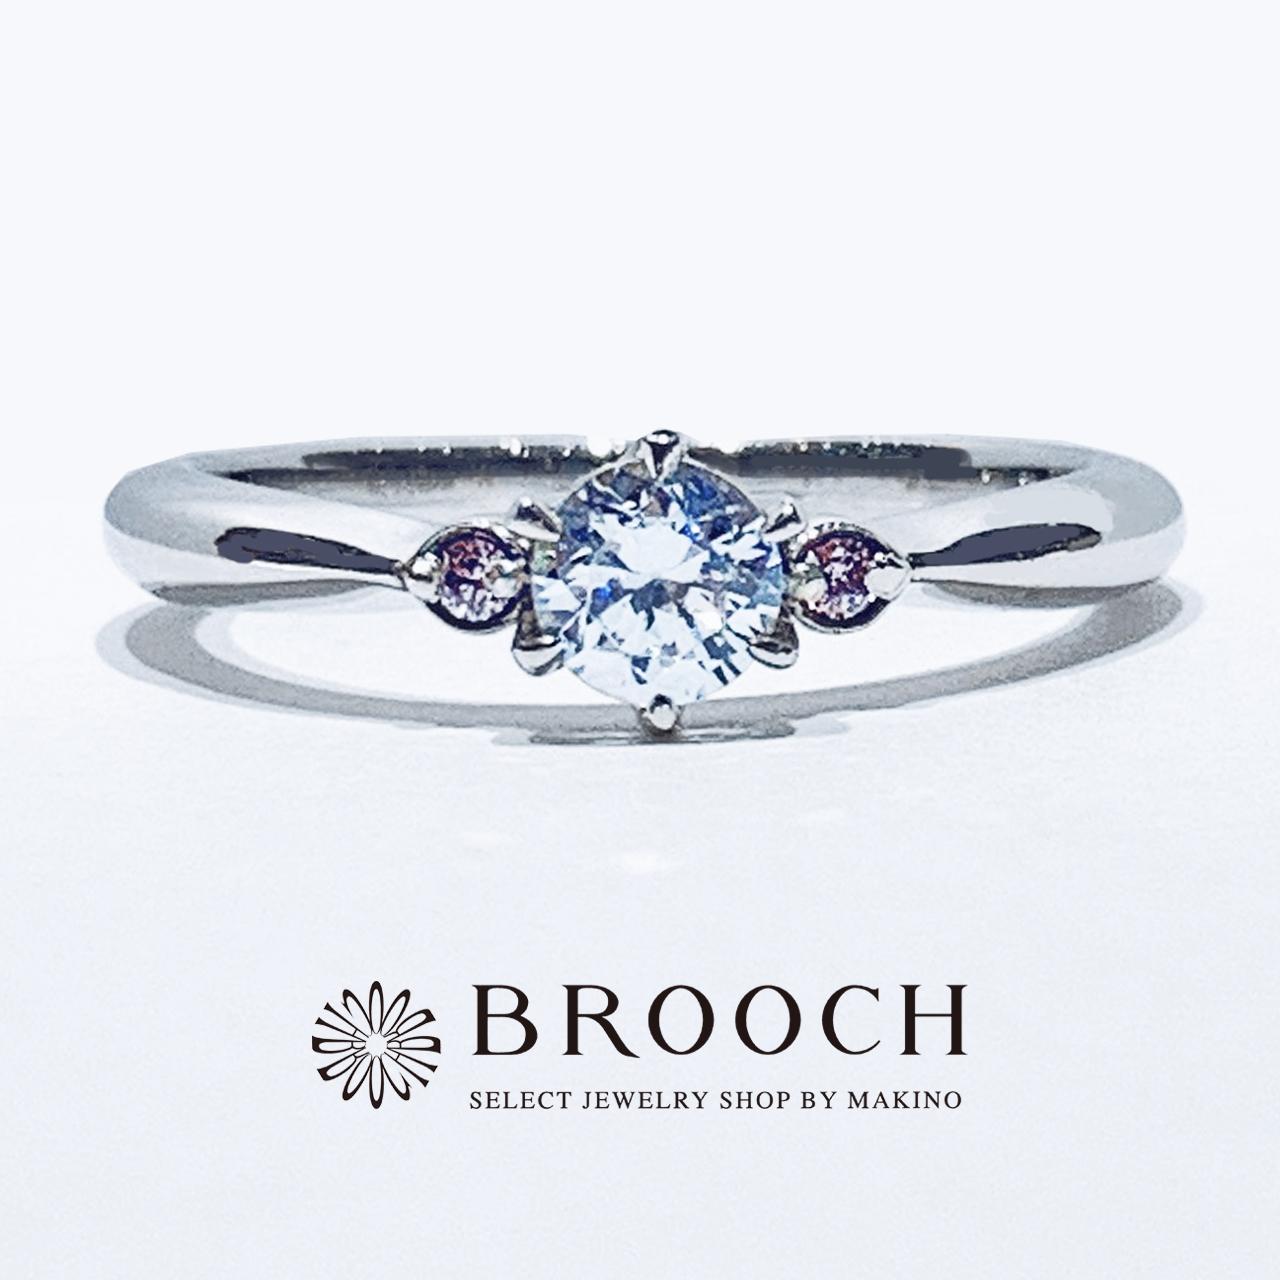 BROOCH 婚約指輪 エンゲージリング シンプルキュート両サイドピンク